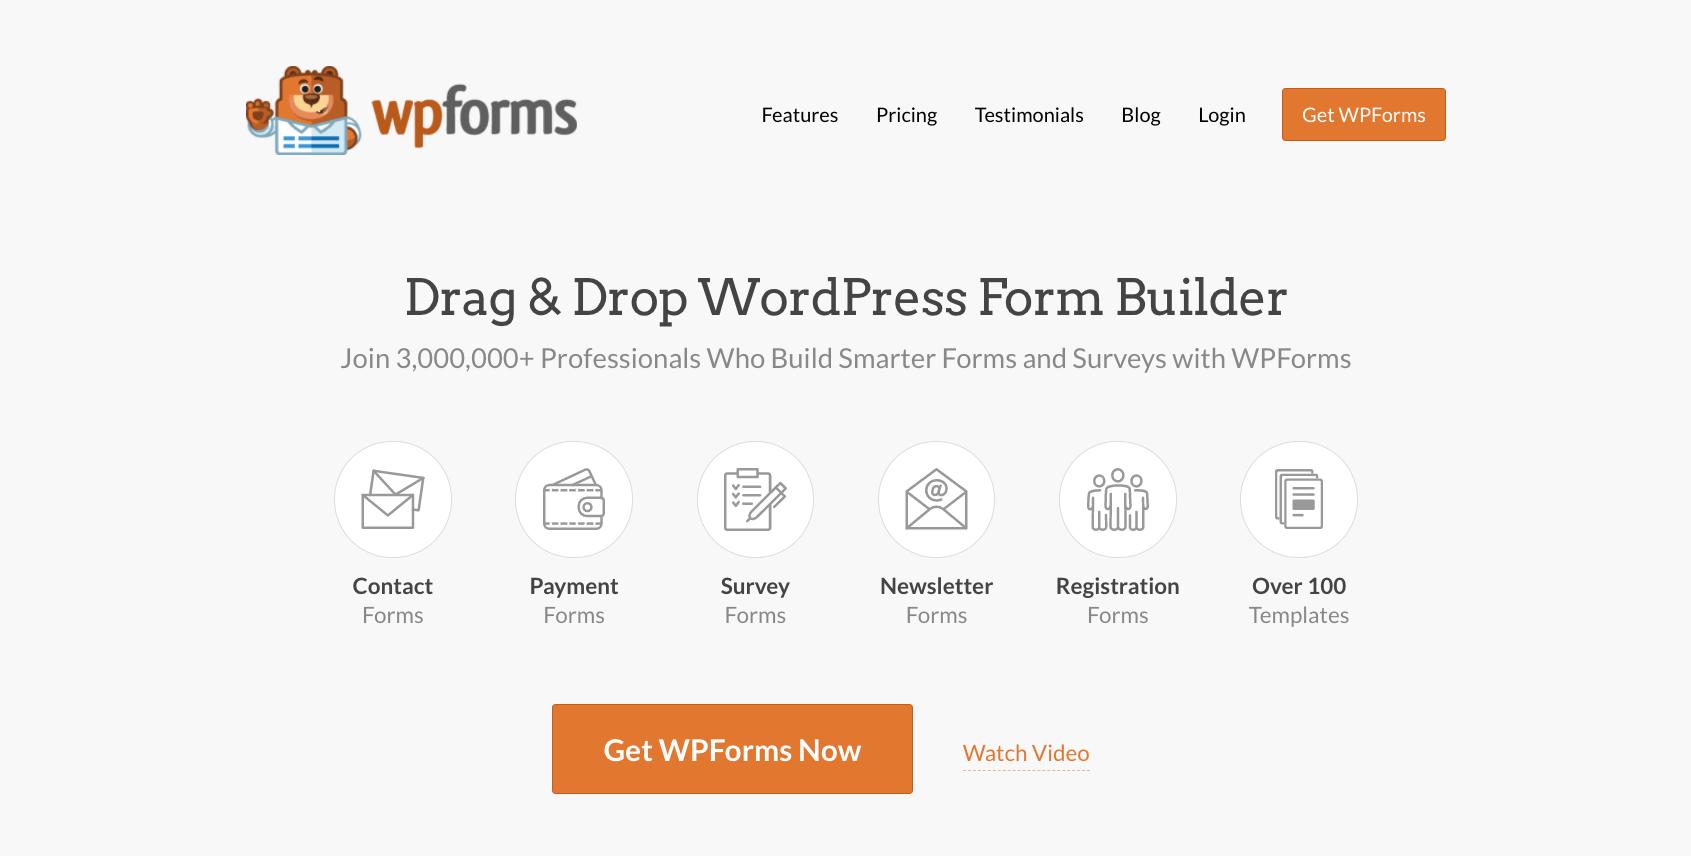 WordPress multilingual forms: WPForms